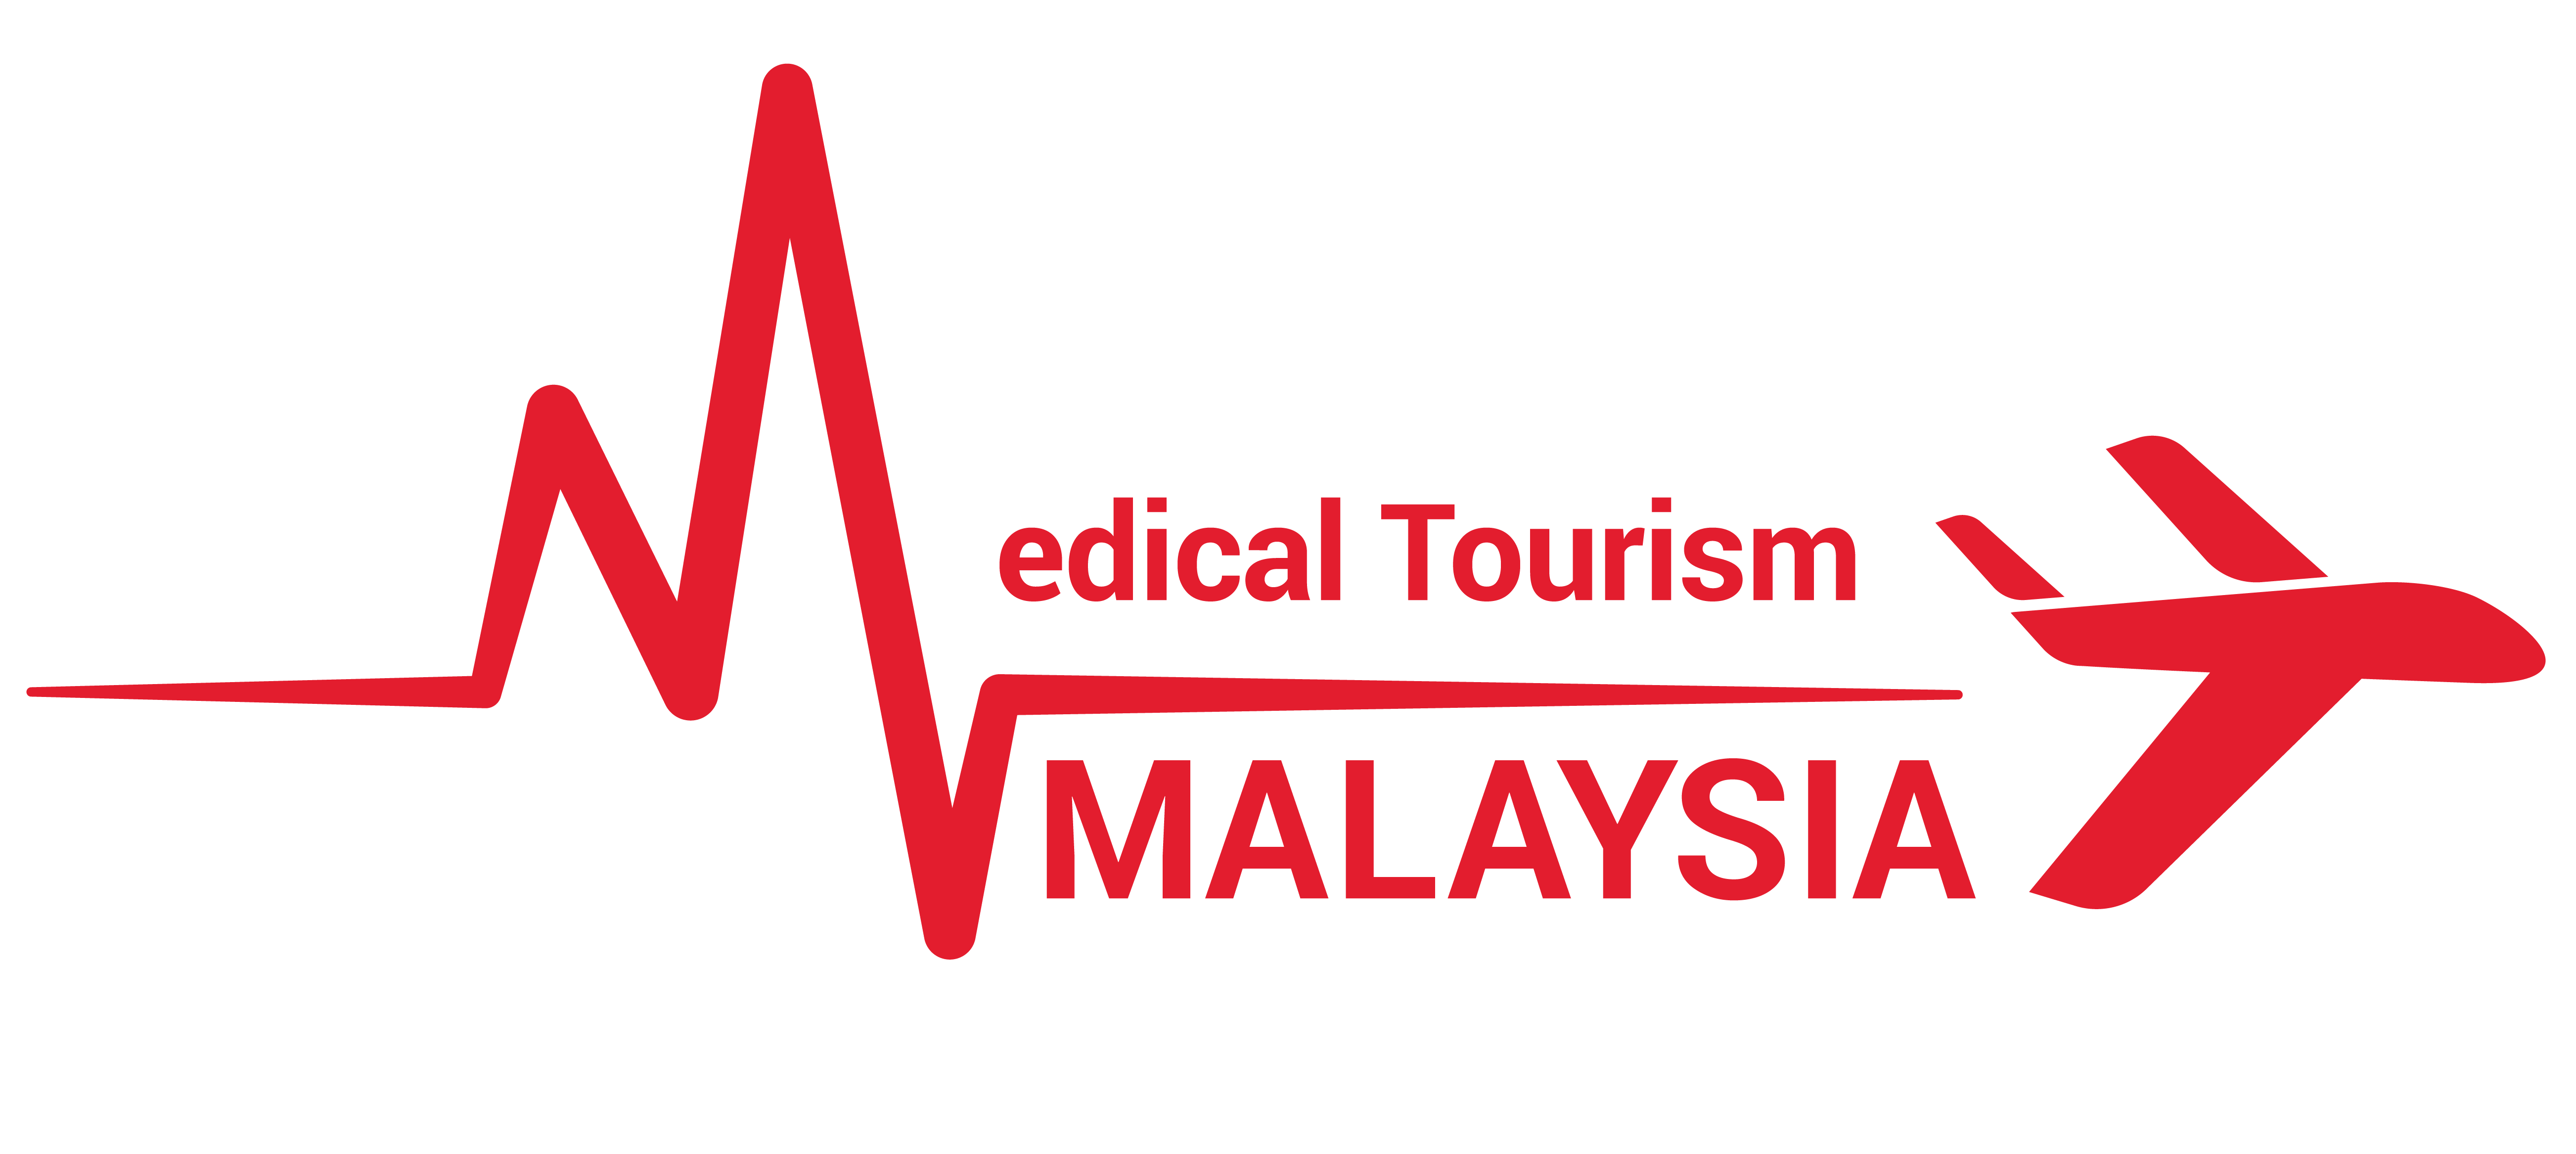 Inilah Alasan Malaysia JadTempat Wisata Medis Asia